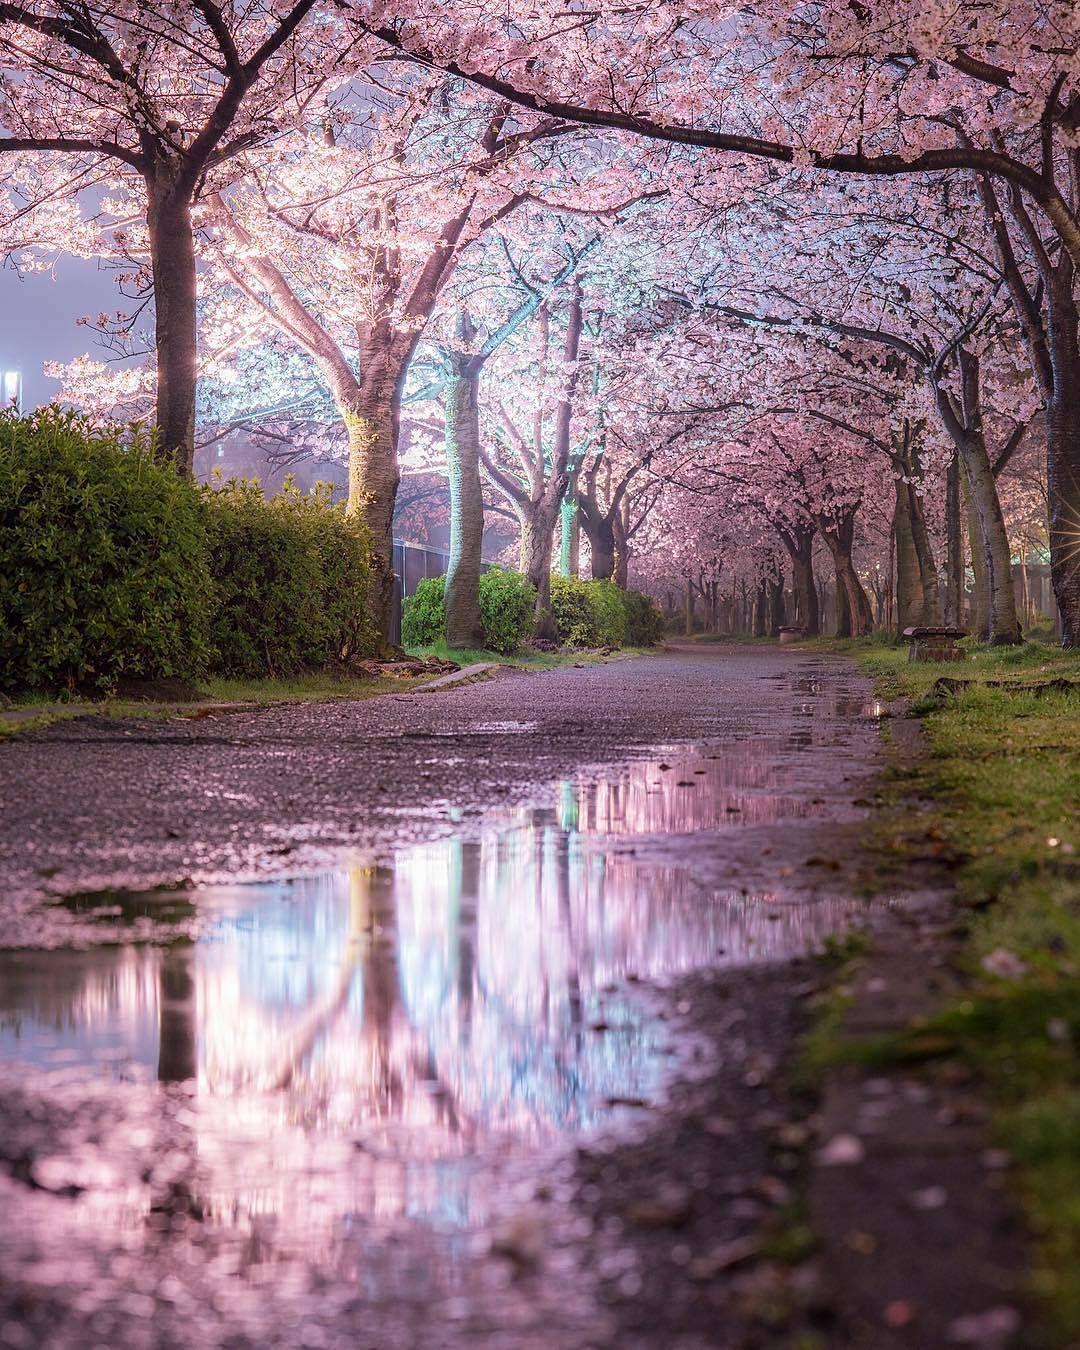 Sakura Reflection Osaka Japan Pc Godive2000 Fotografi Alam Pemandangan Latar Belakang